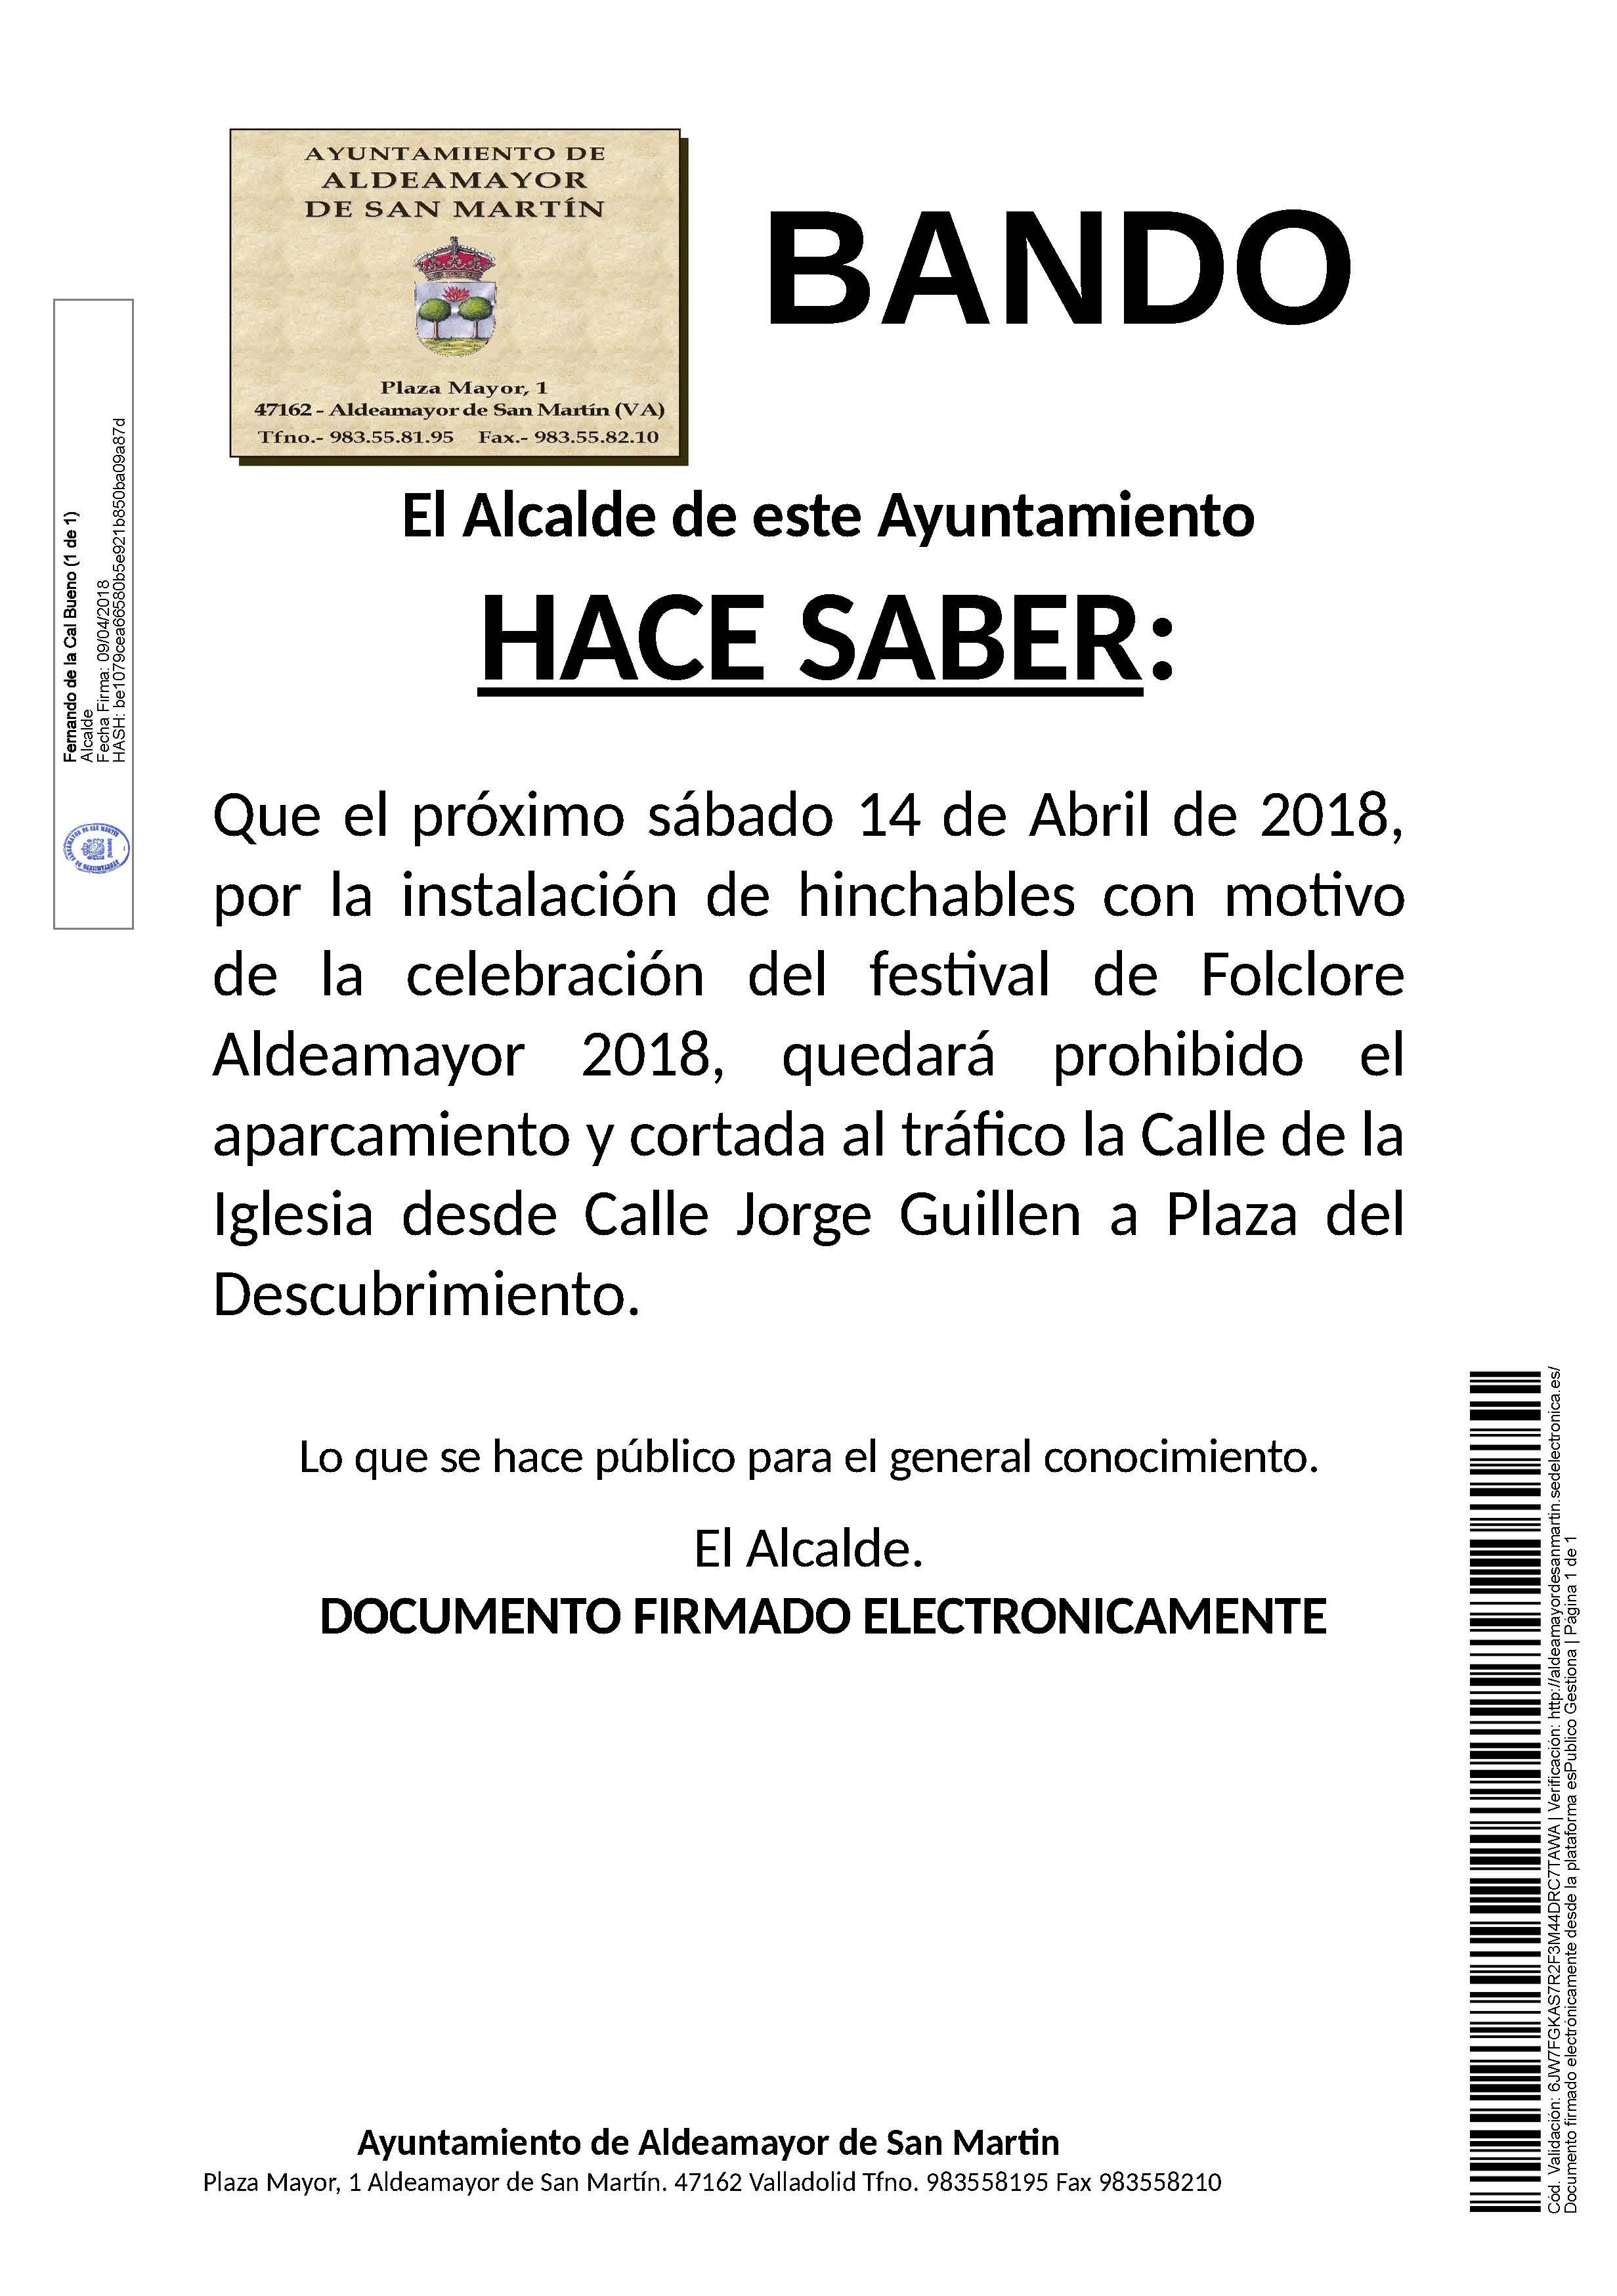 index of archivos aldeamayordesanmartin